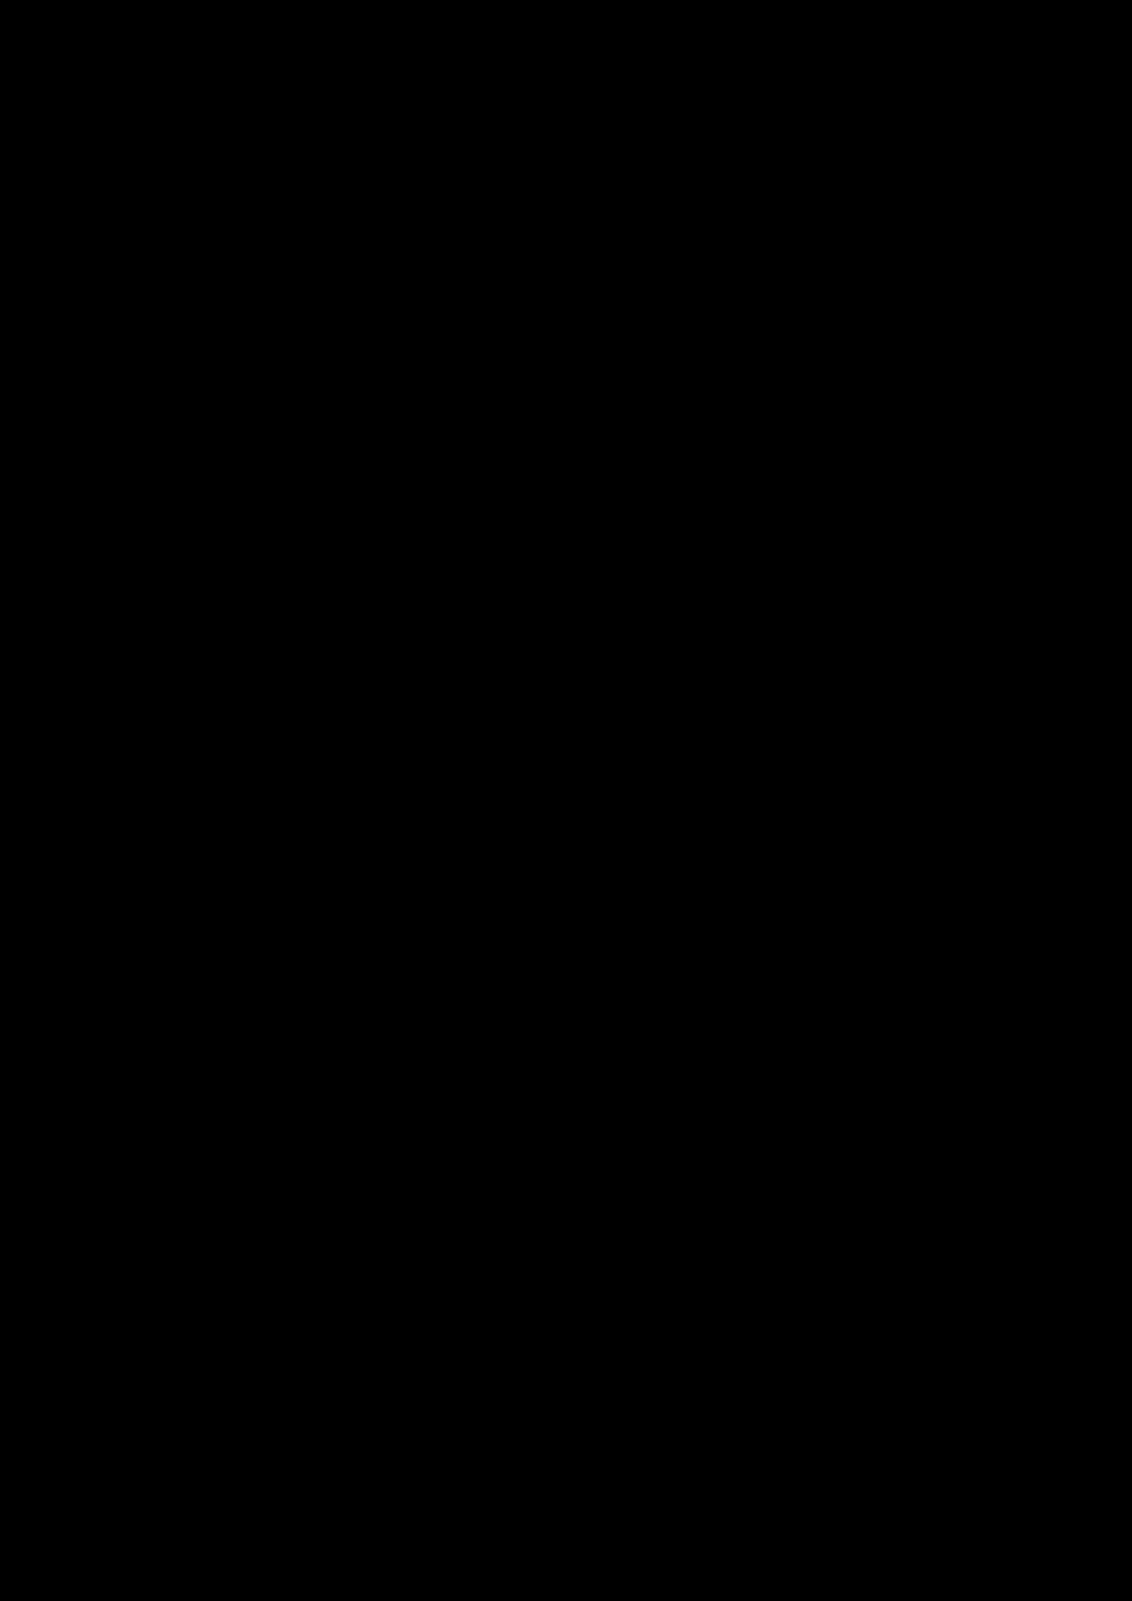 Prosti slide, Image 6